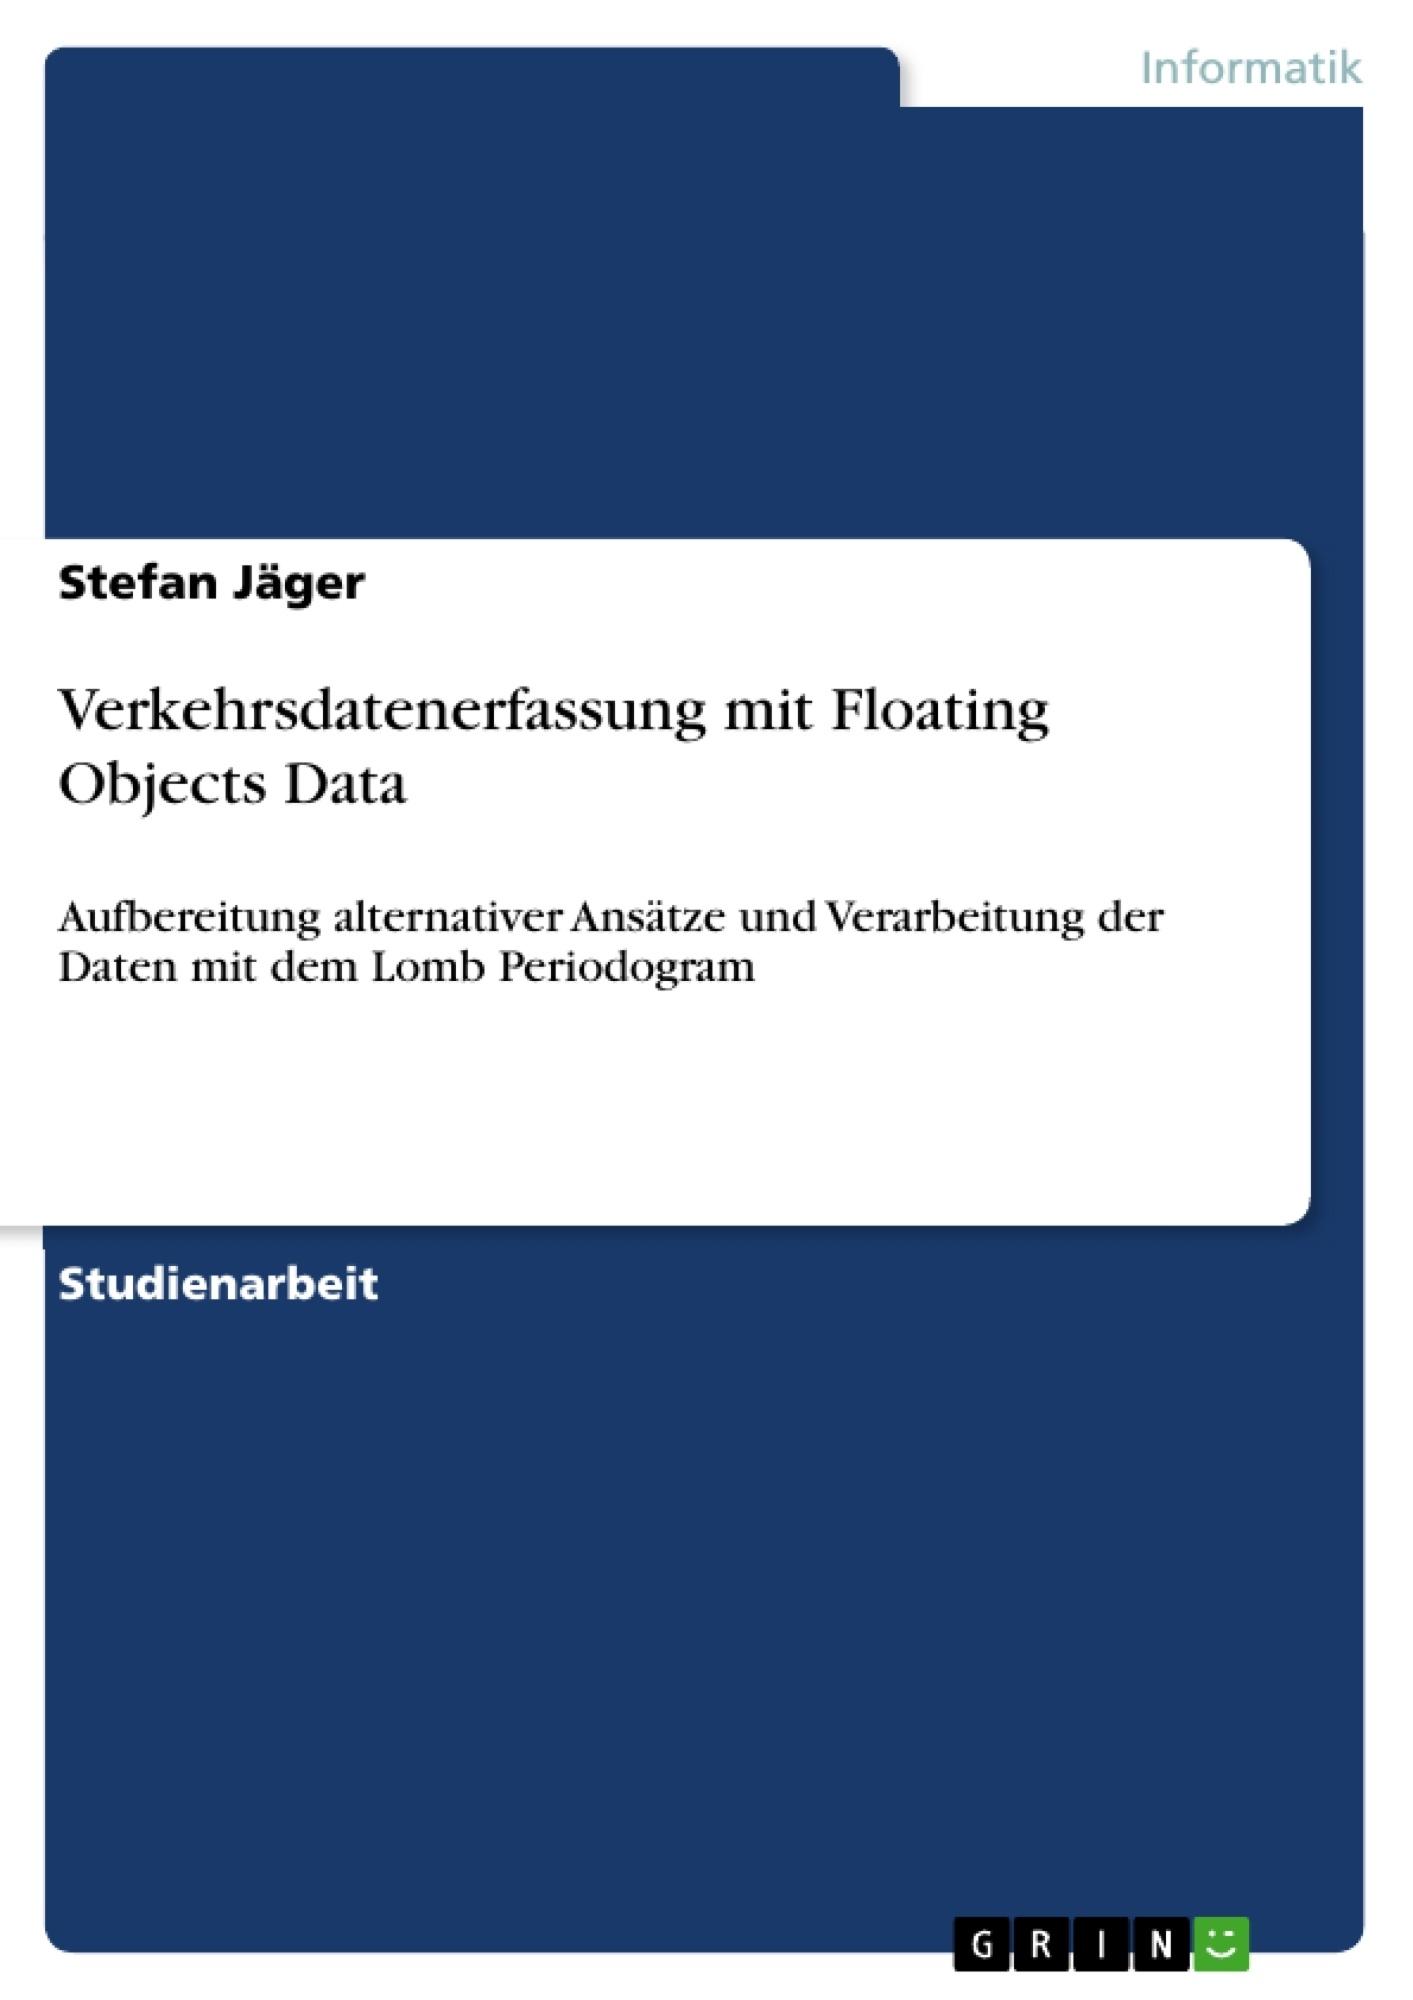 Titel: Verkehrsdatenerfassung mit Floating Objects Data